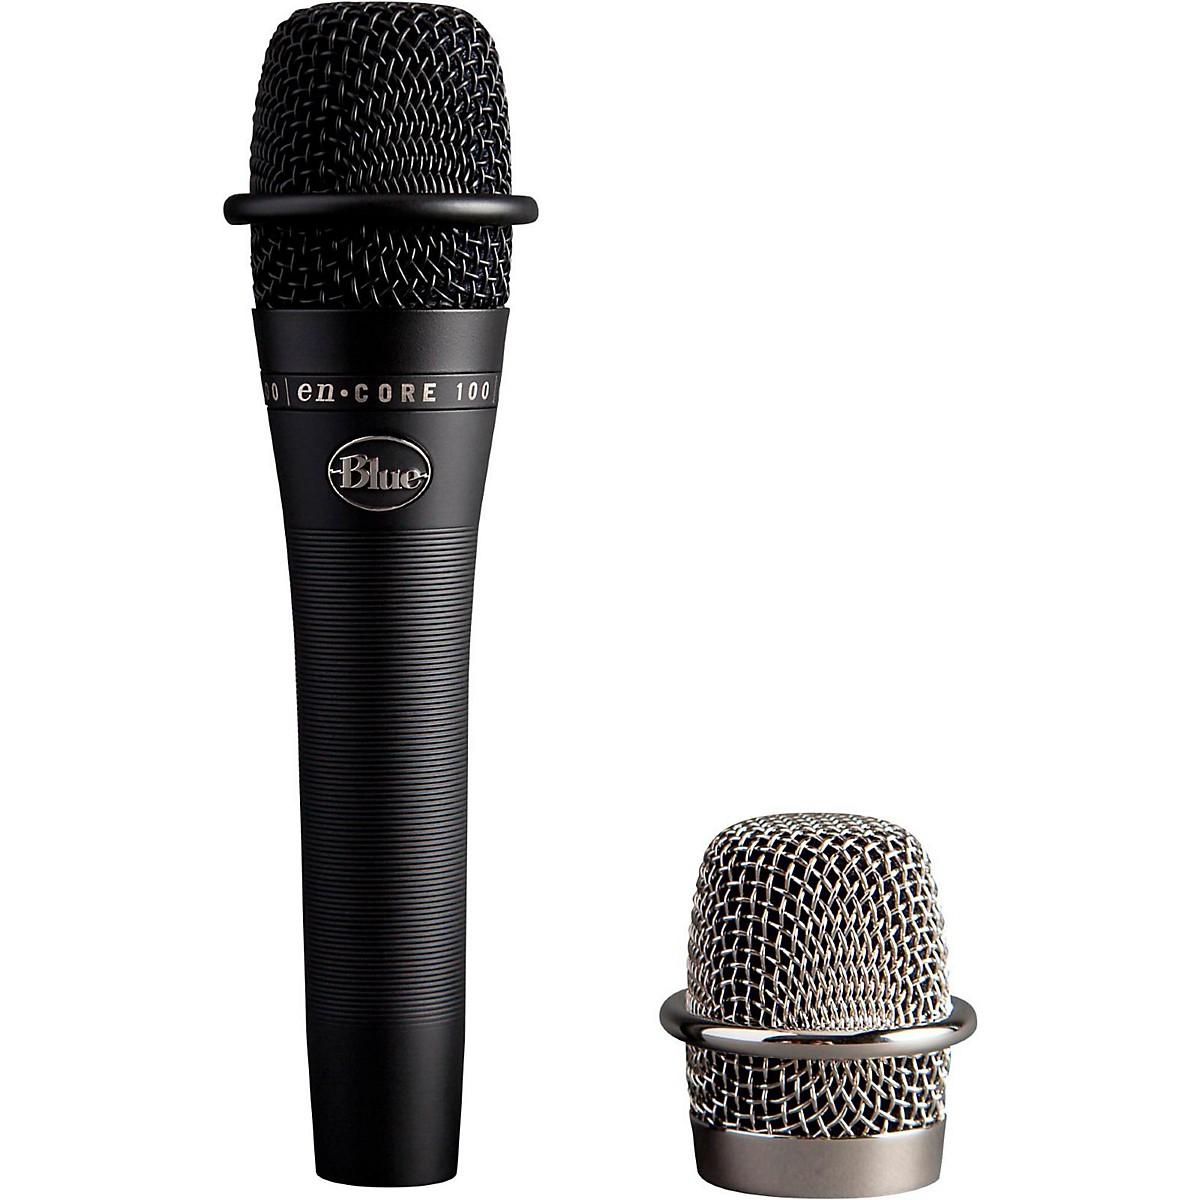 BLUE enCORE 100 Studio Grade Dynamic Microphone